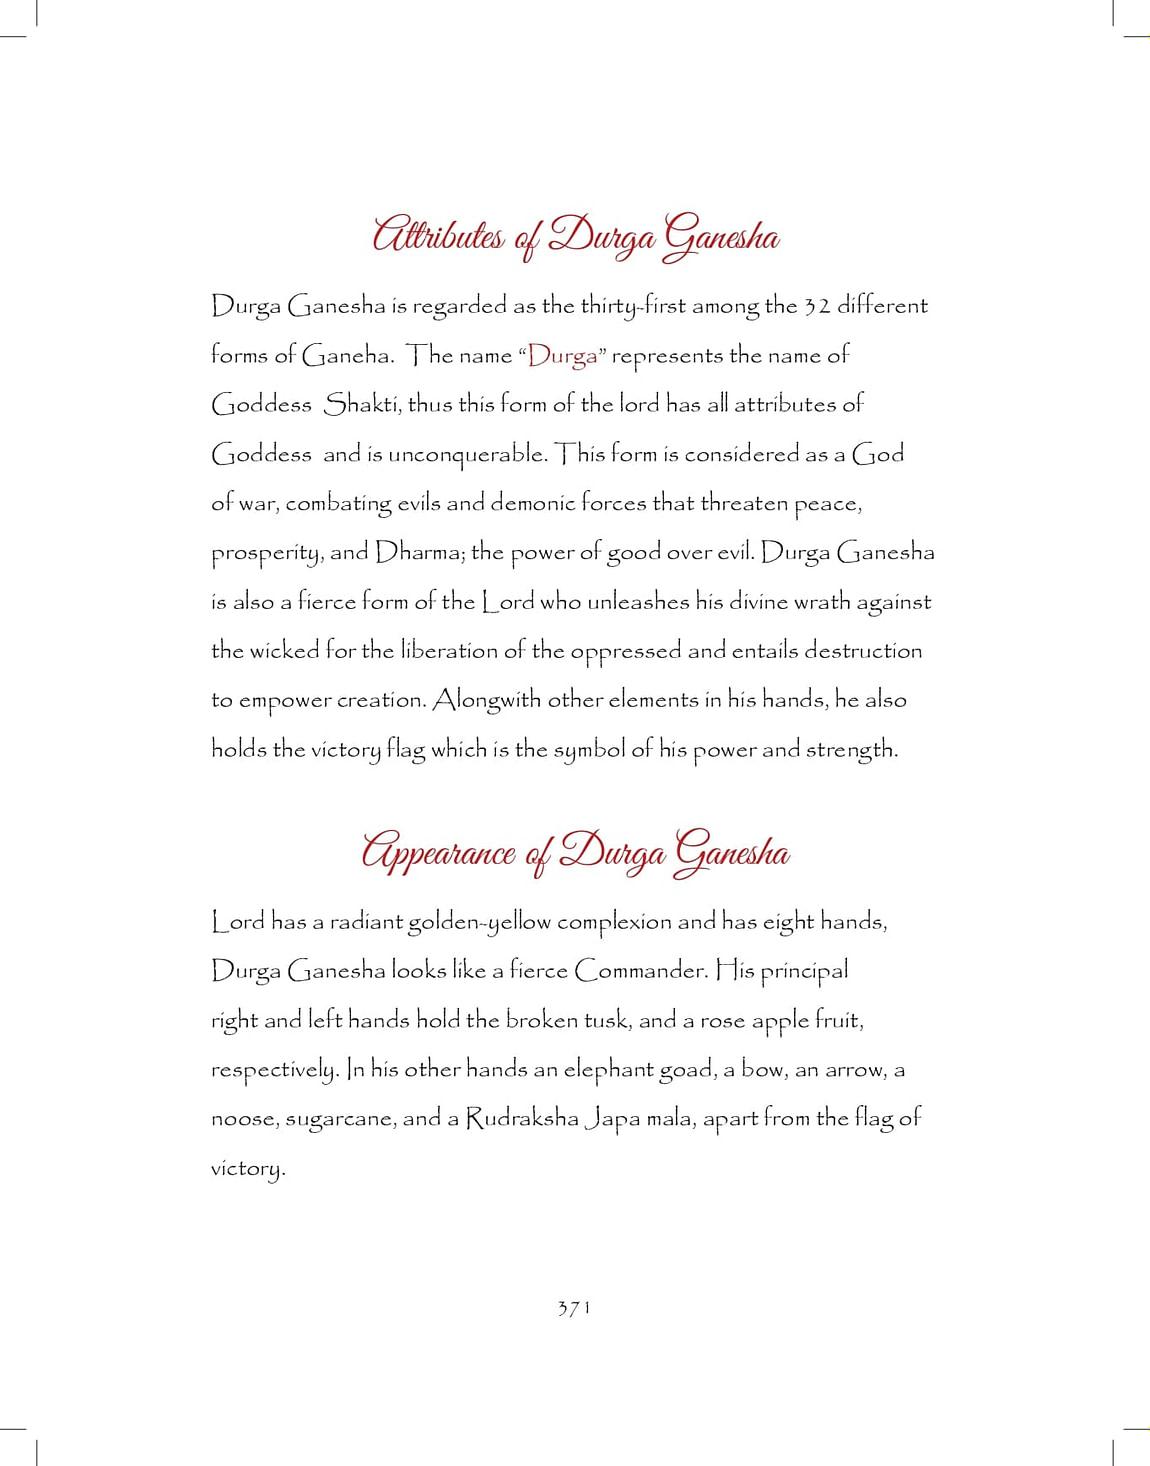 Ganesh-print_pages-to-jpg-0371.jpg